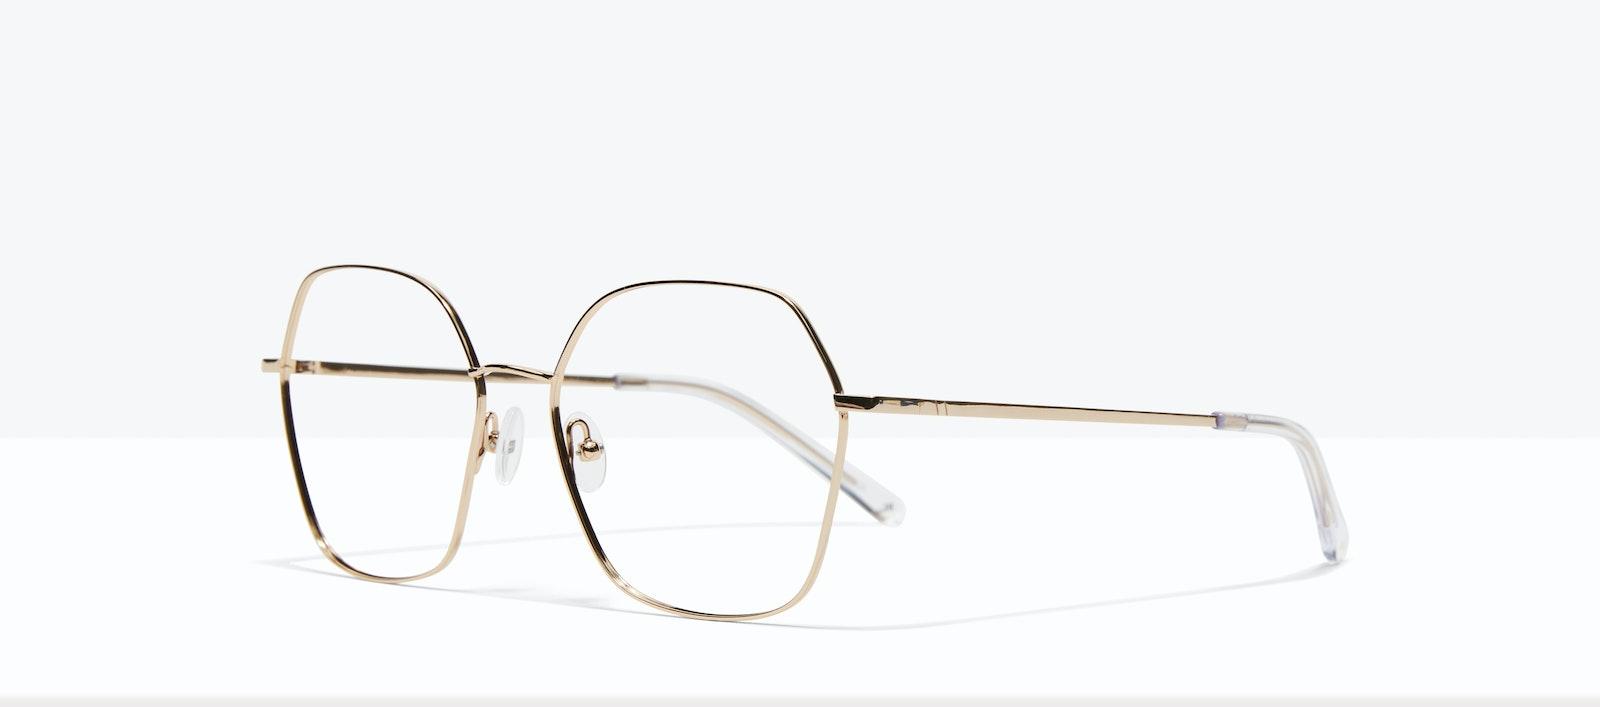 Affordable Fashion Glasses Square Eyeglasses Women Mersey Gold Tilt